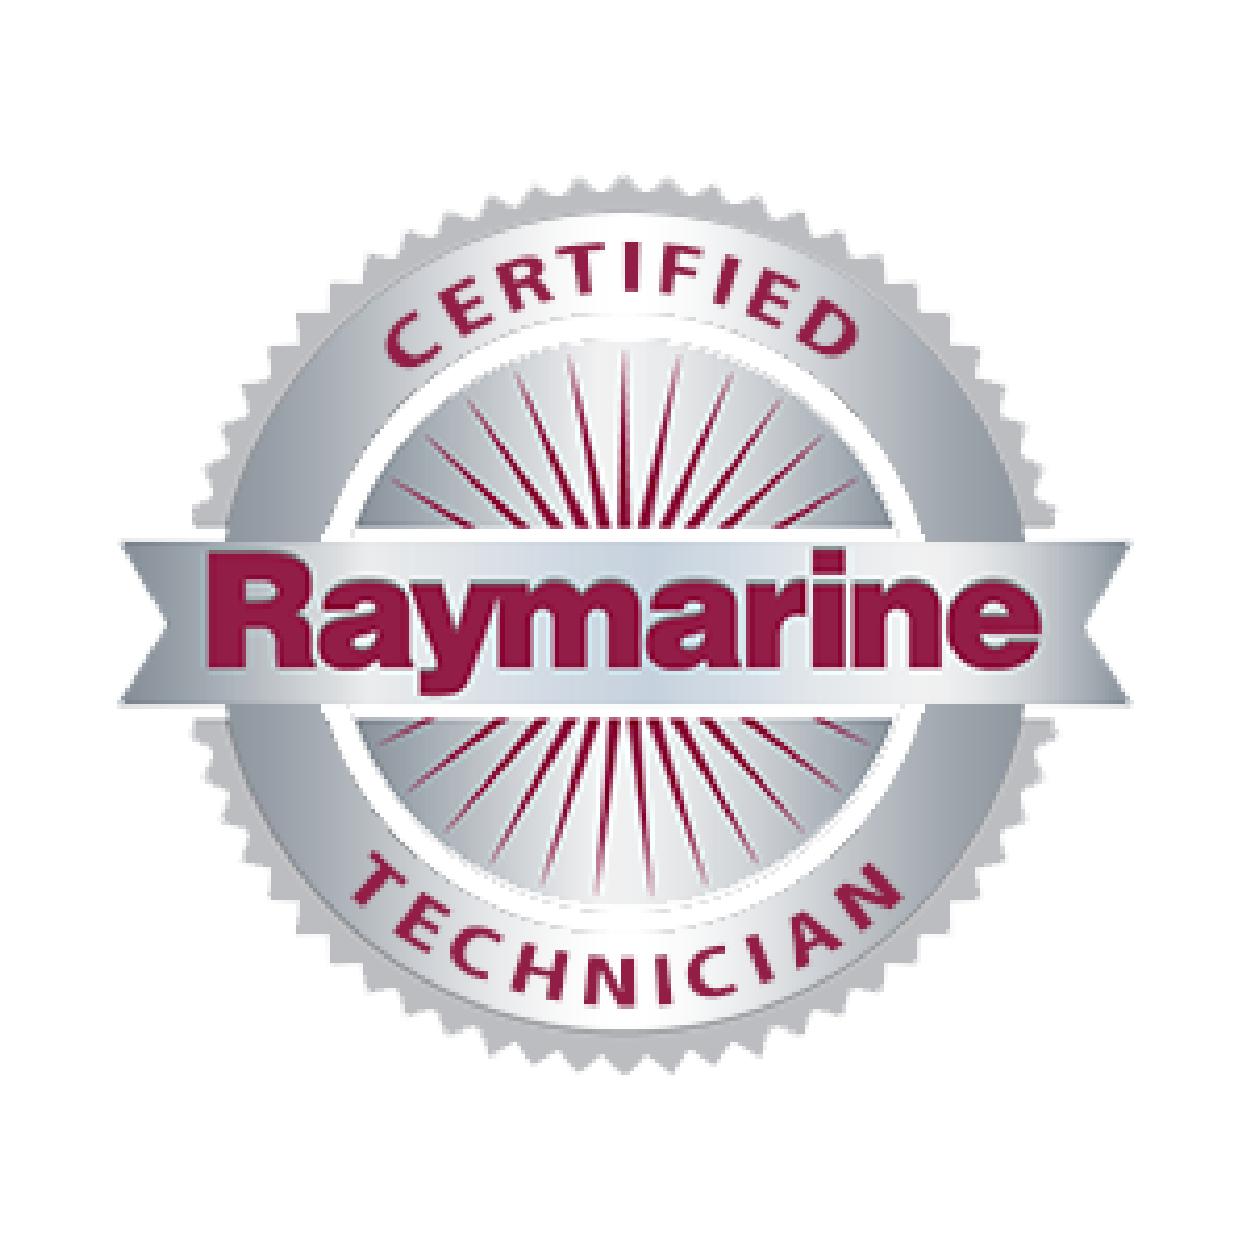 Raymarine Certified Technician.png